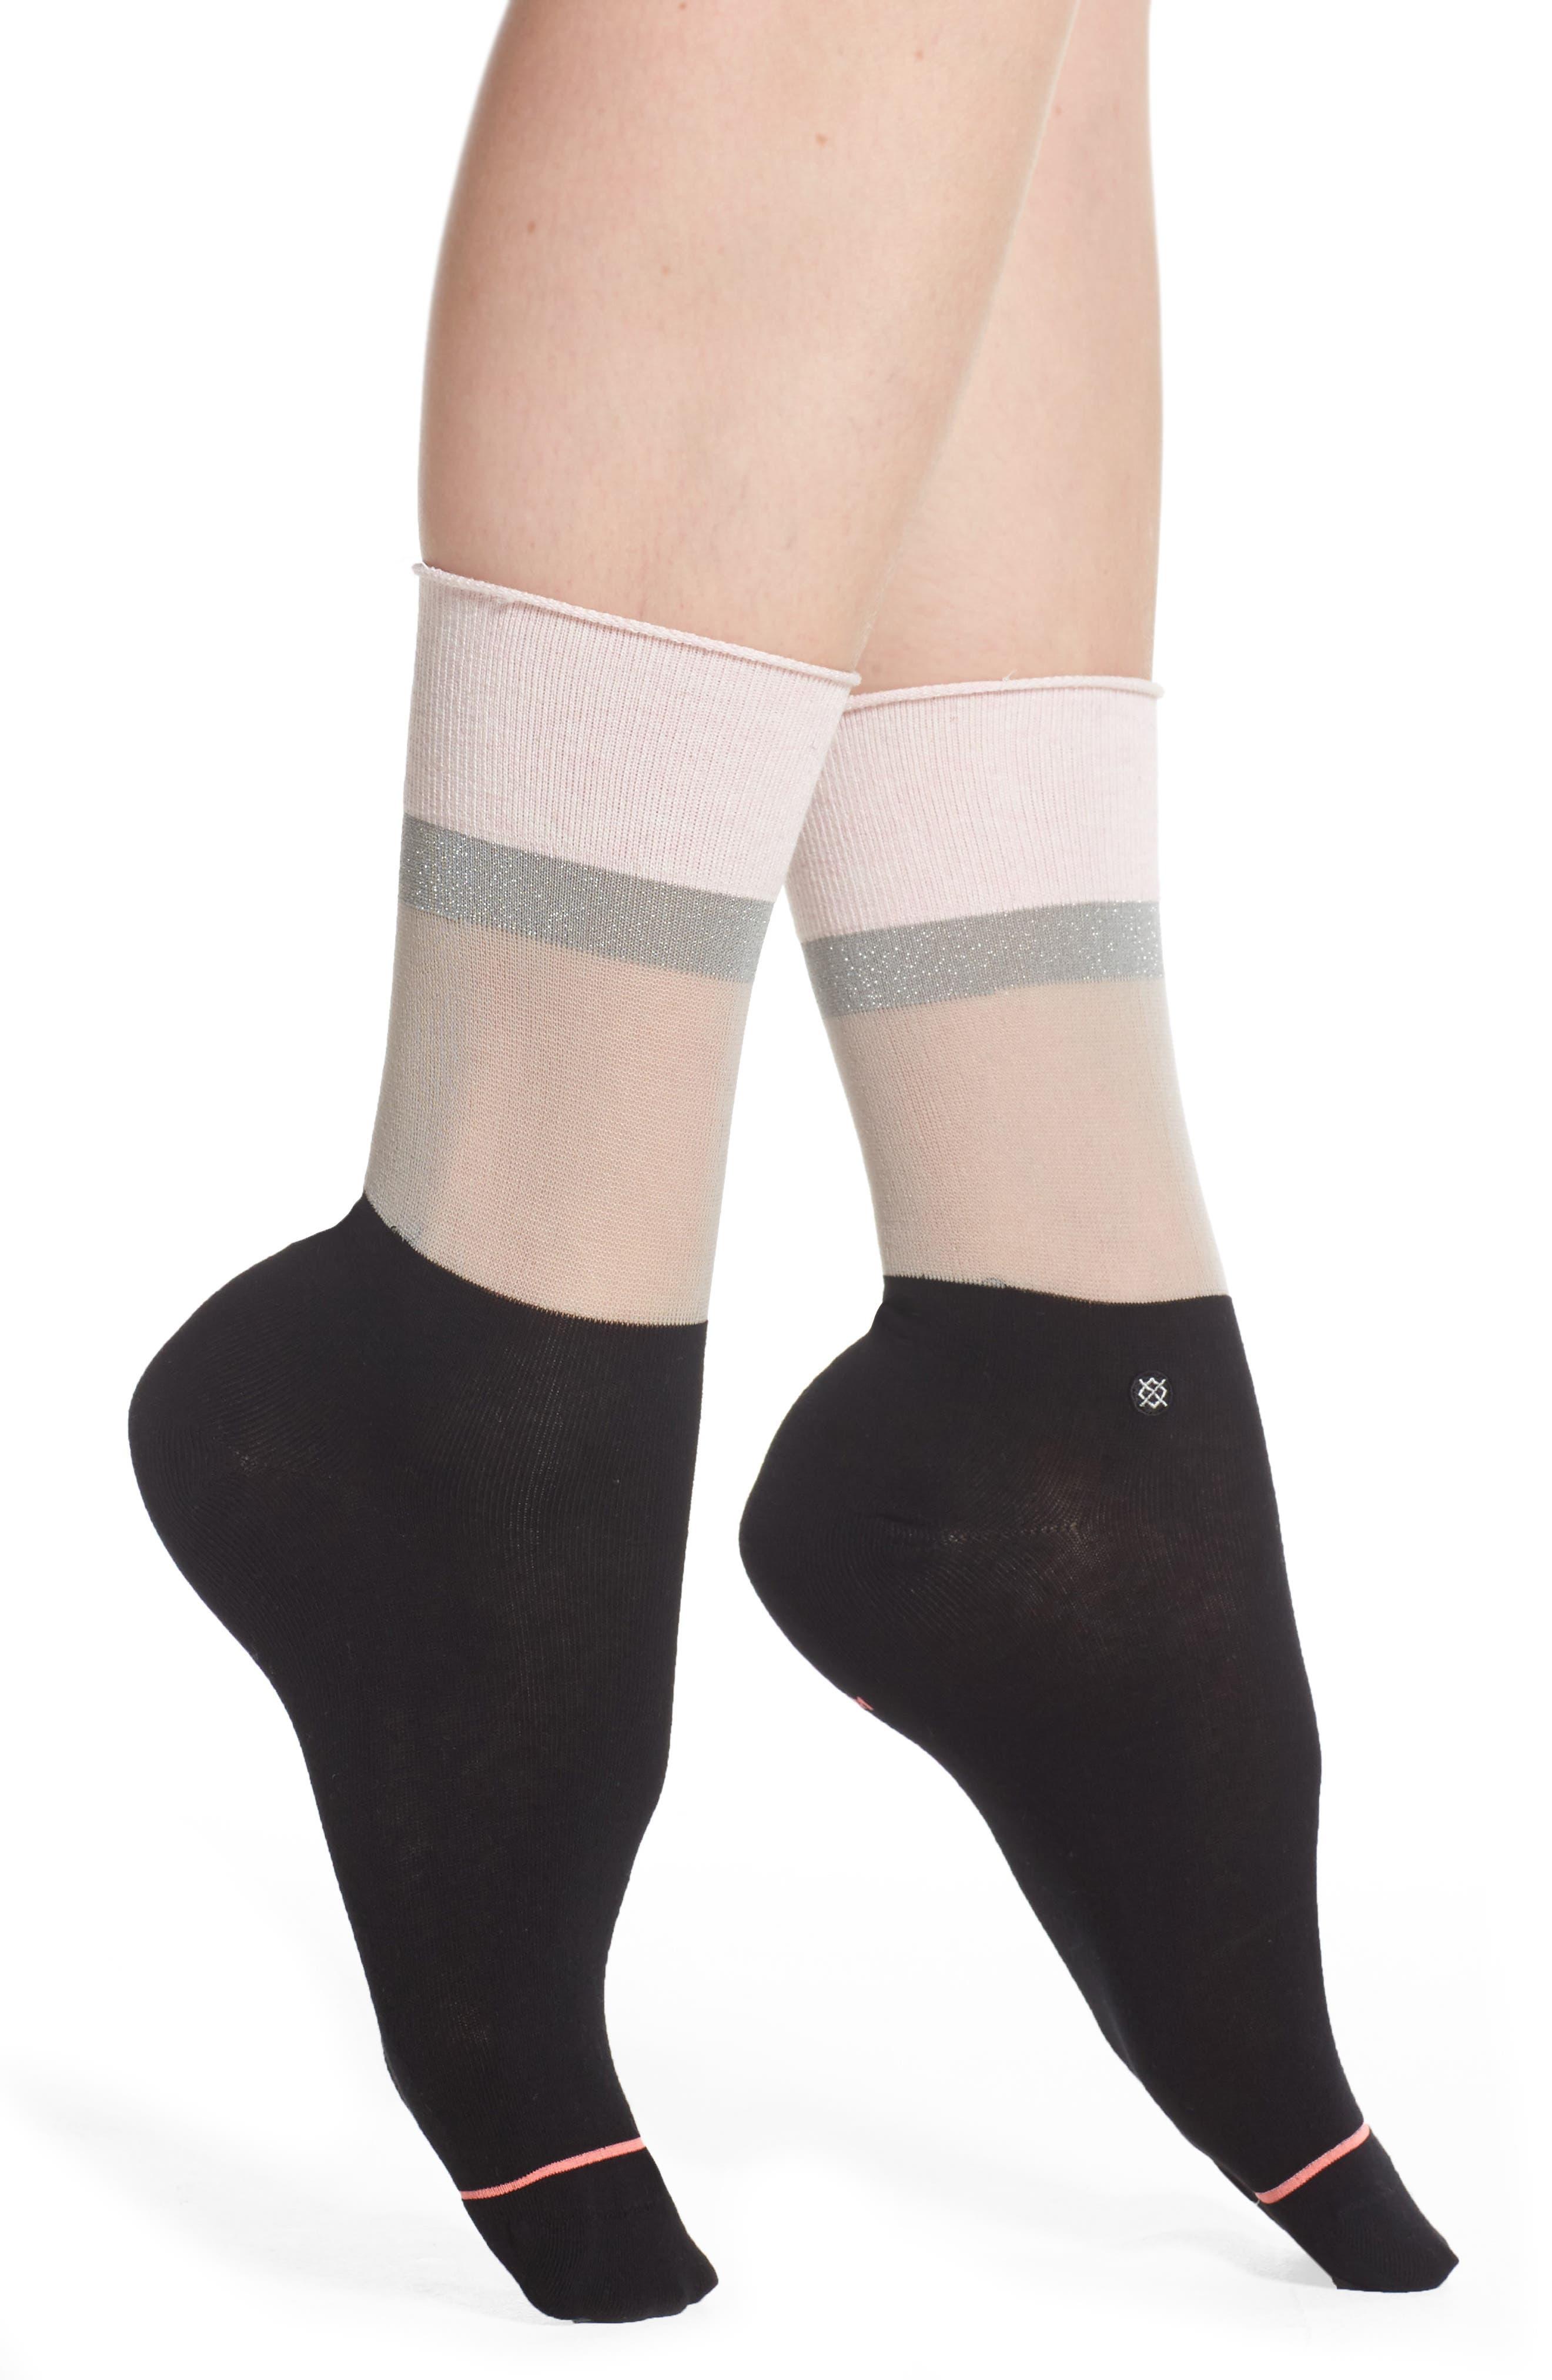 Cara Crew Socks,                             Main thumbnail 1, color,                             Black